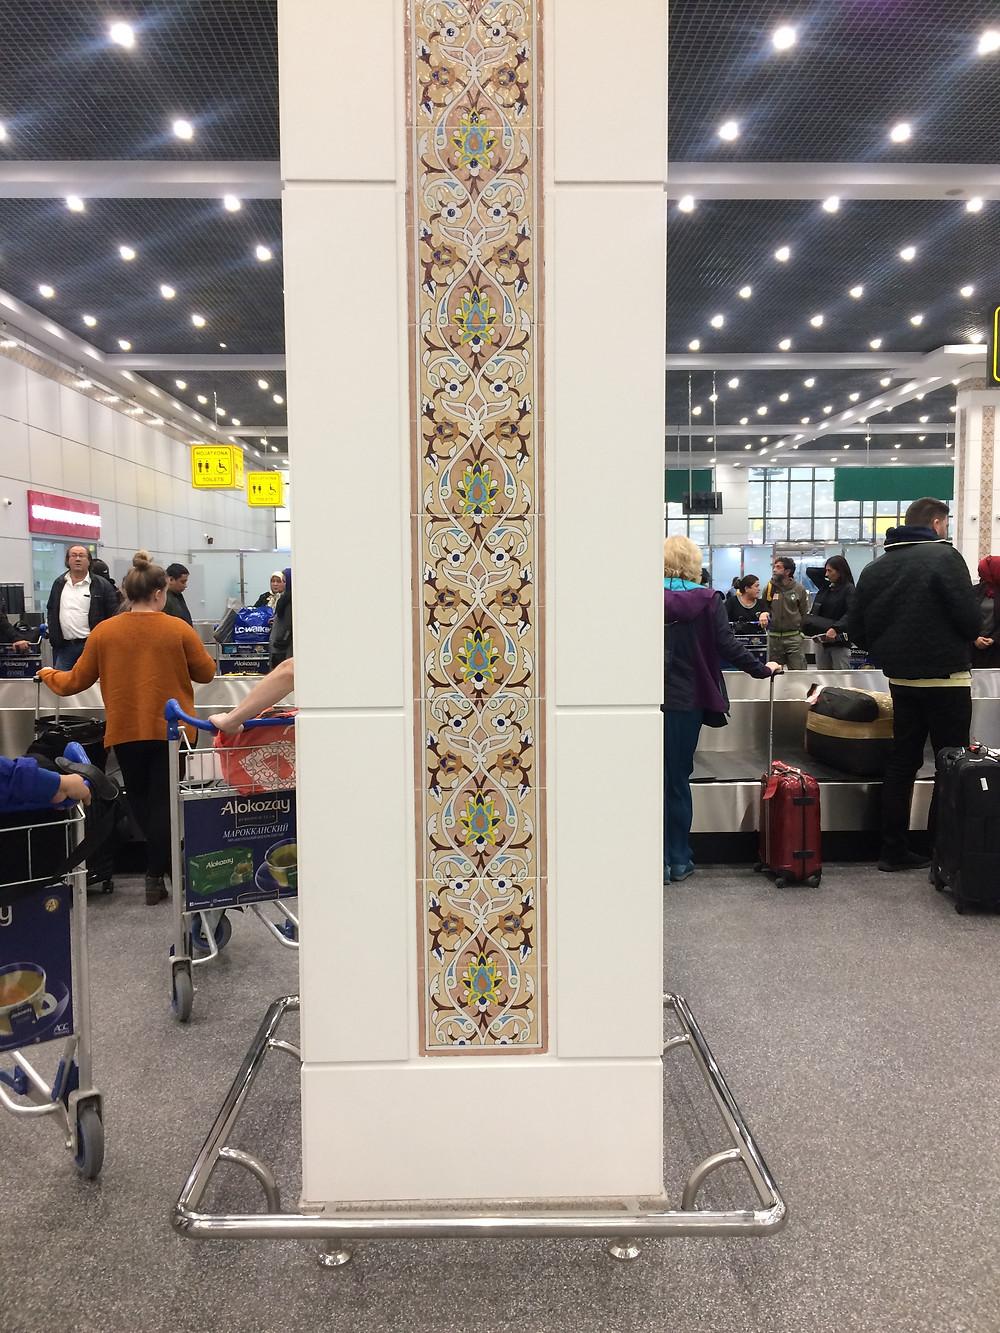 taschkent_terminal_muster